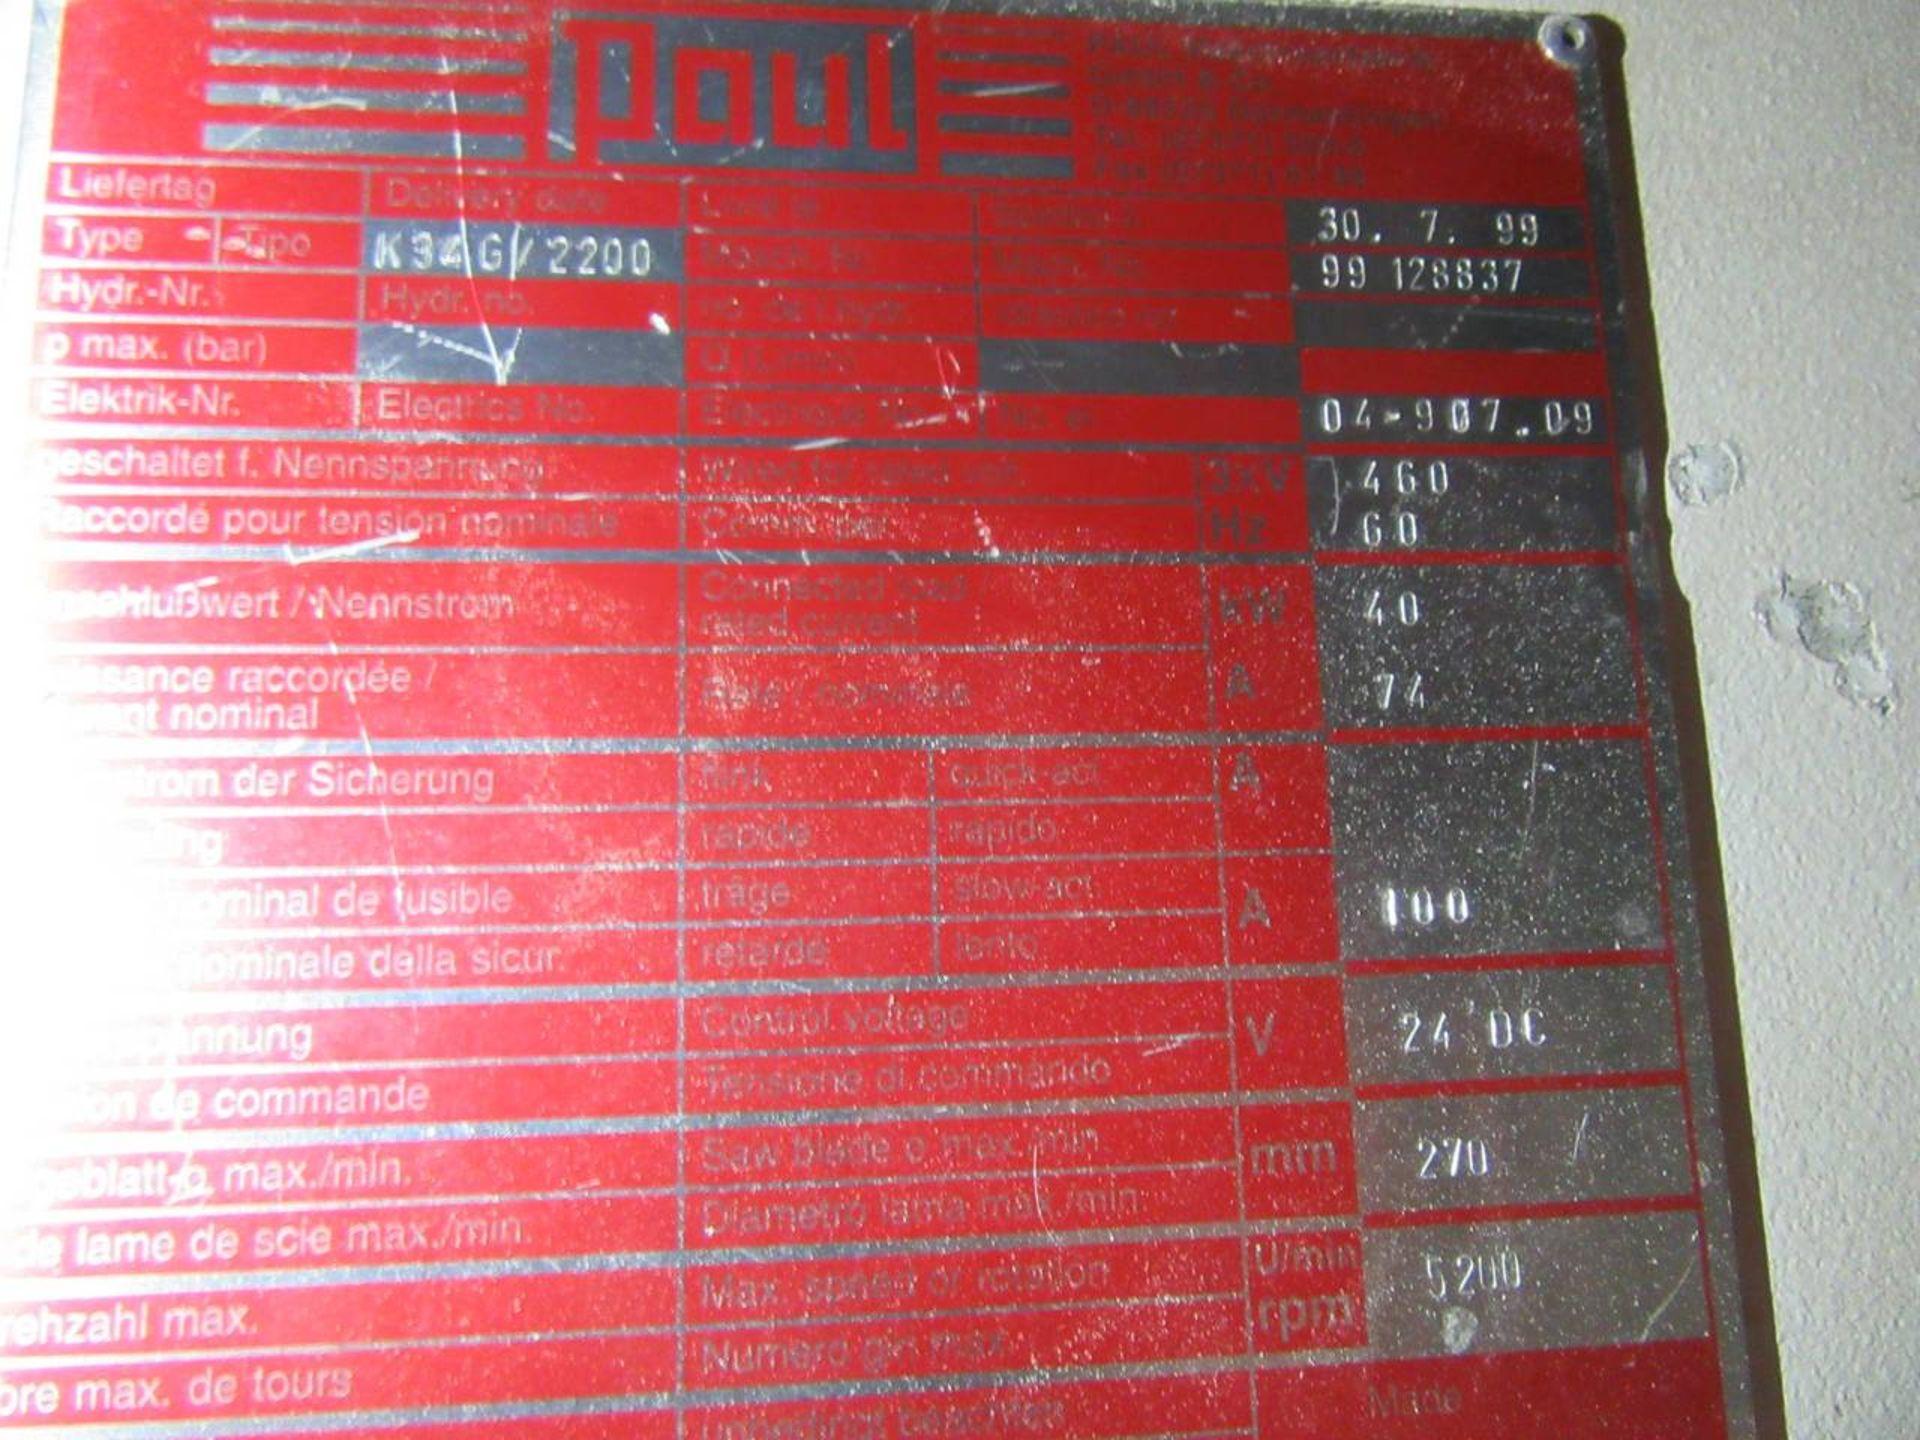 Lot 3 - 1999 Paul K34G/2200 Rip Saw